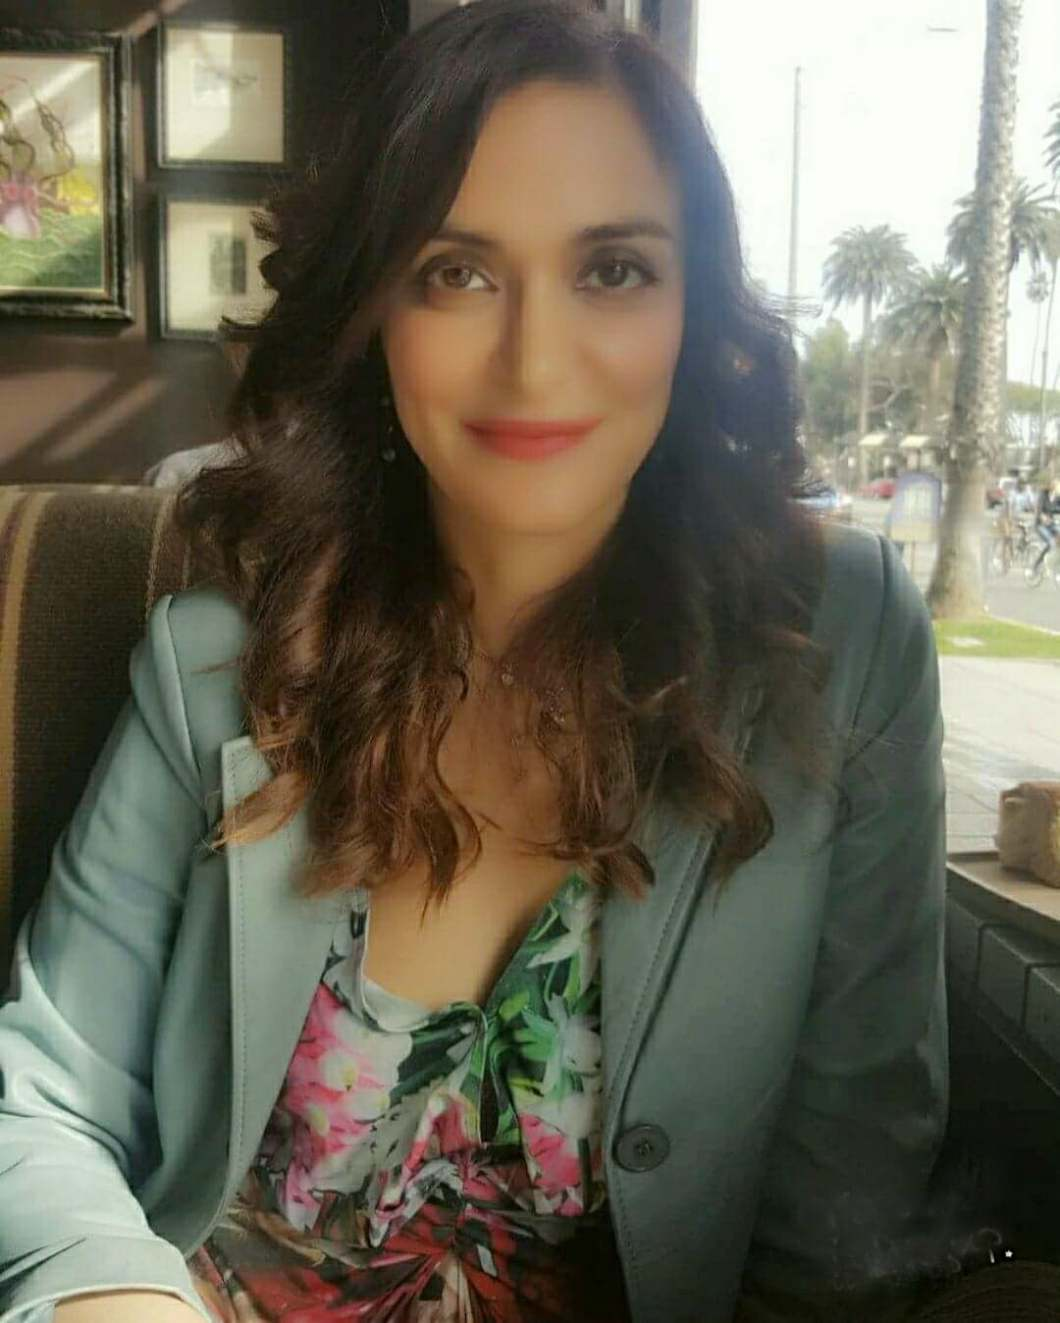 Noted Entertainment Attorney Nadia Davari